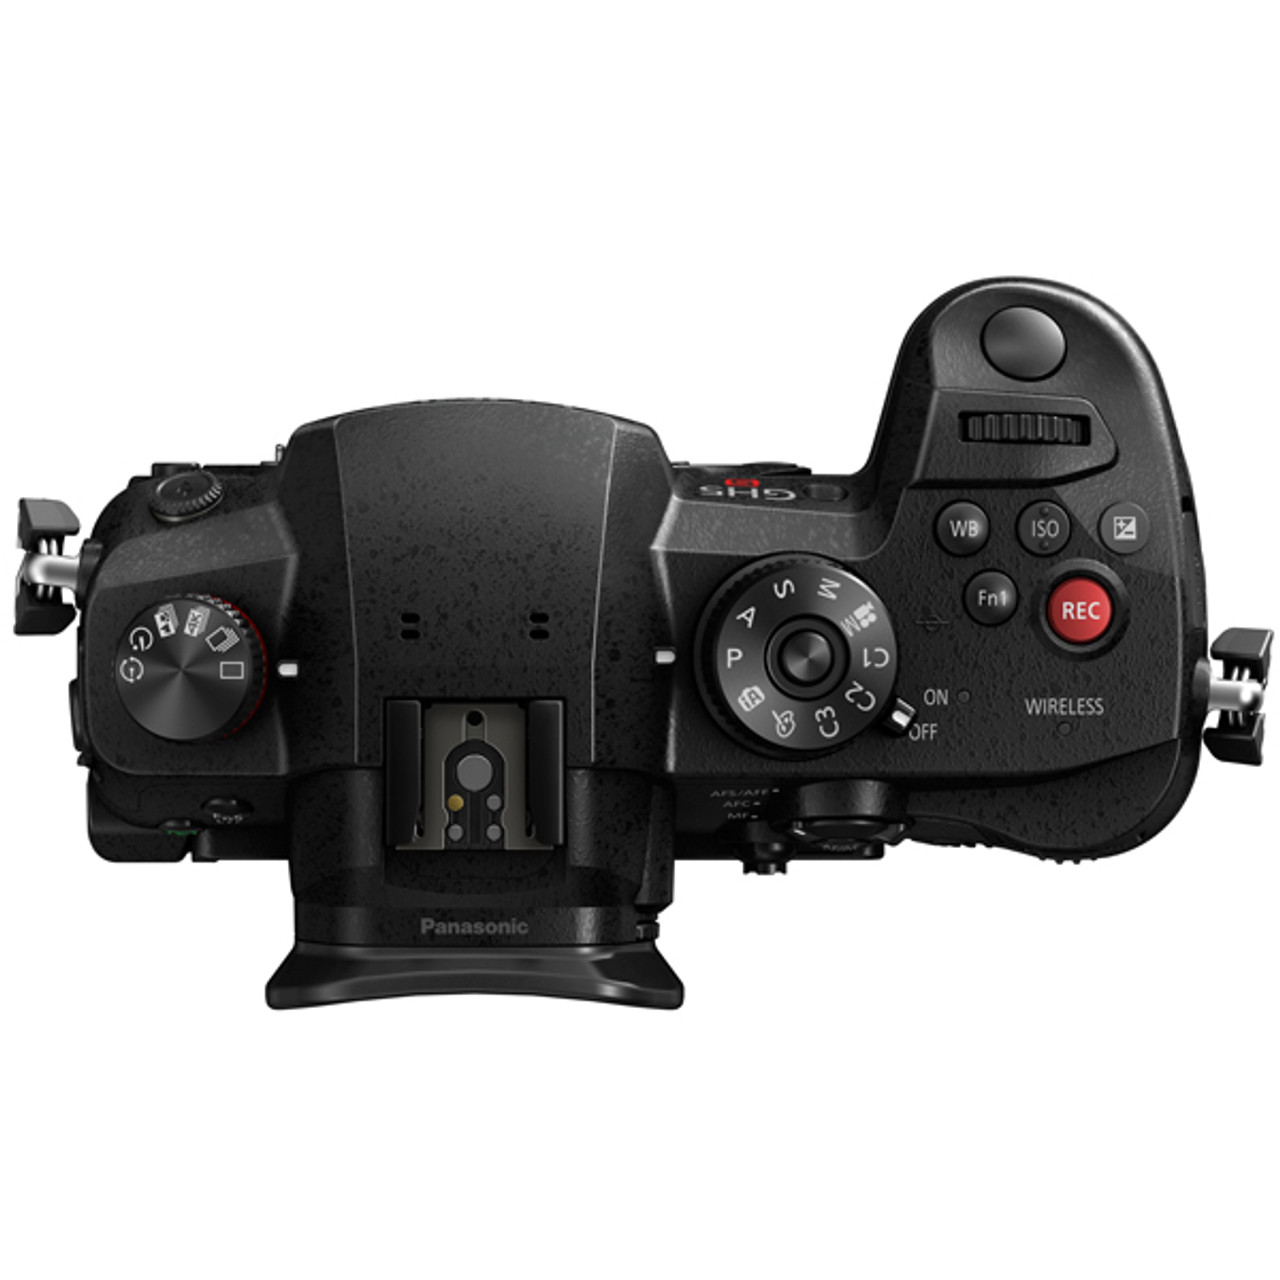 Panasonic DMC-GH5S Body Black